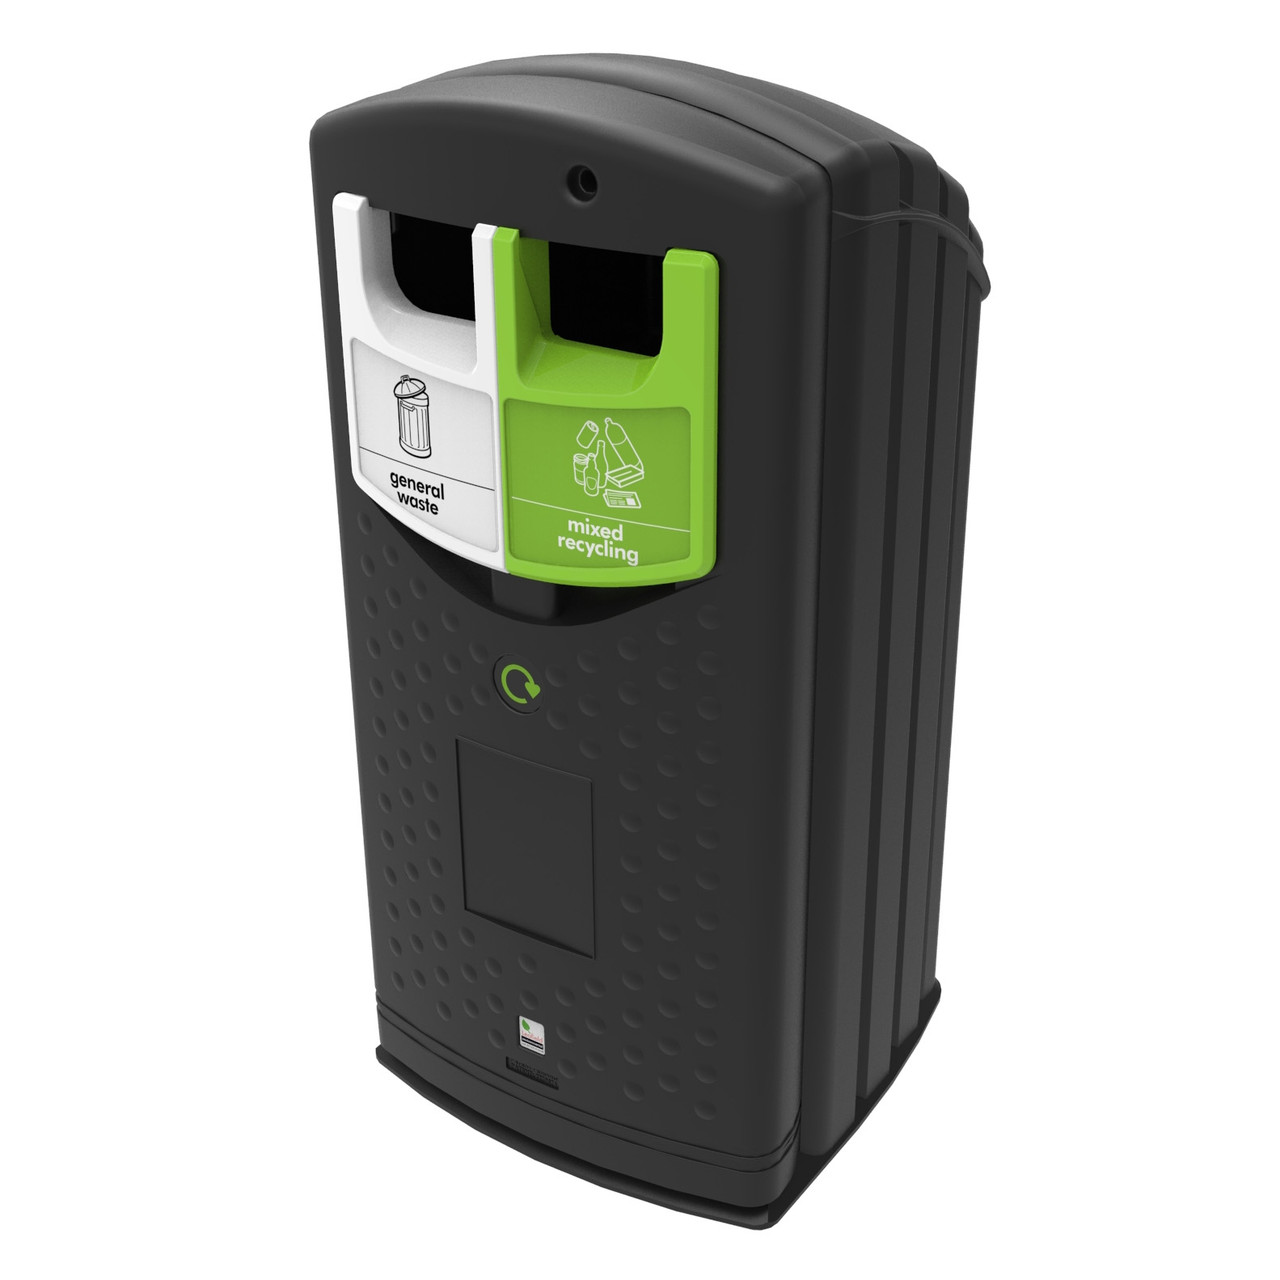 Envirobank split recycling bin 2 x 90L